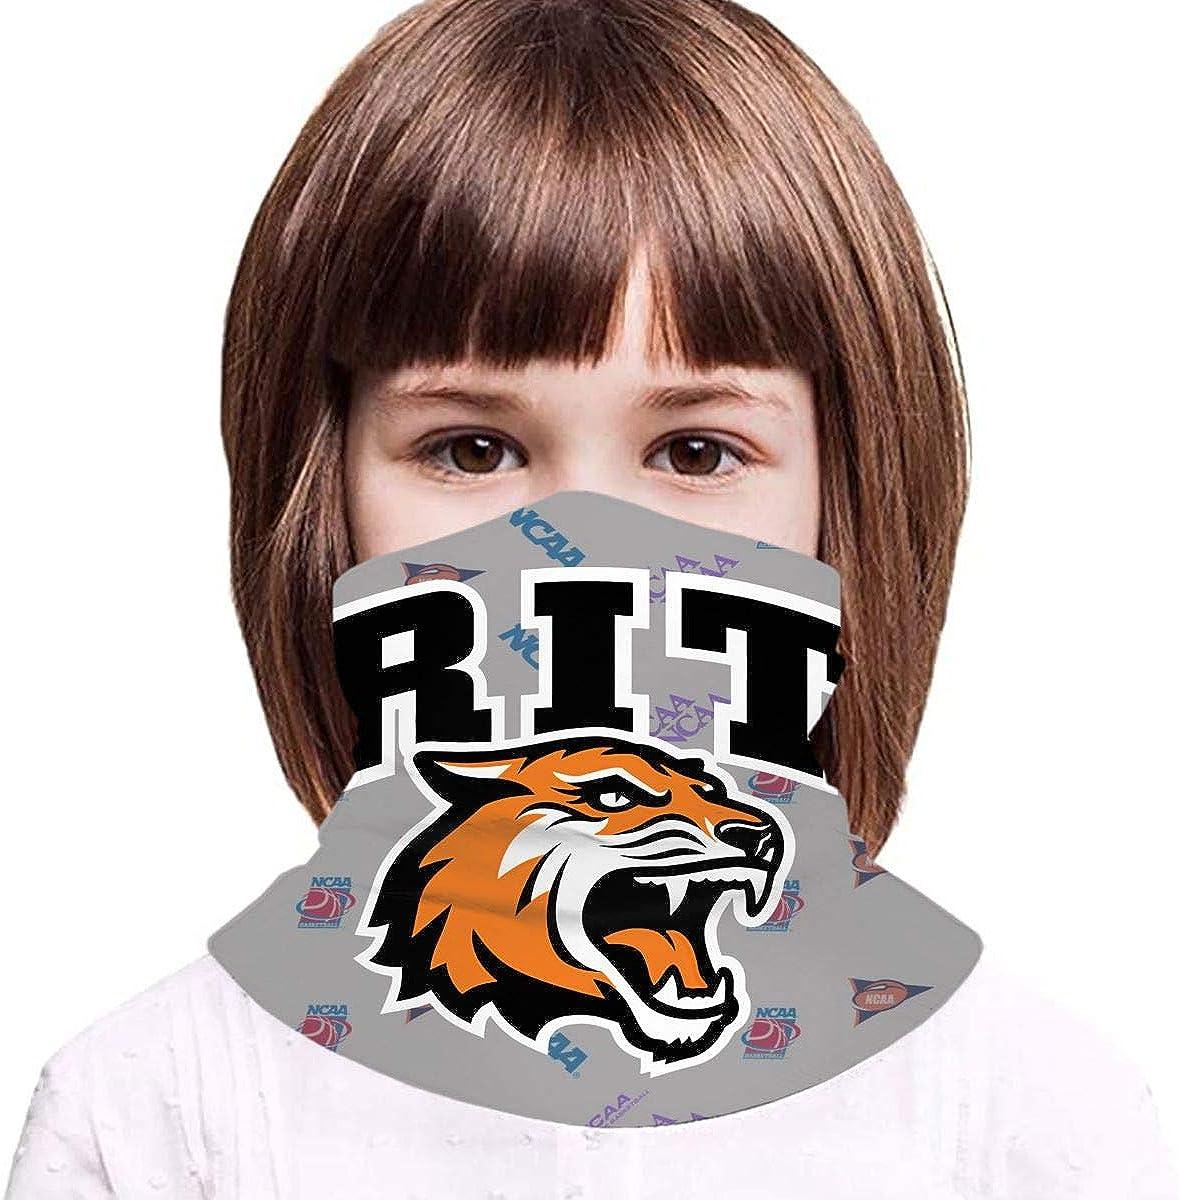 NACC Neck Gaiter Neck Elastic Face Mask Headband Bandana for Outdoor Sport